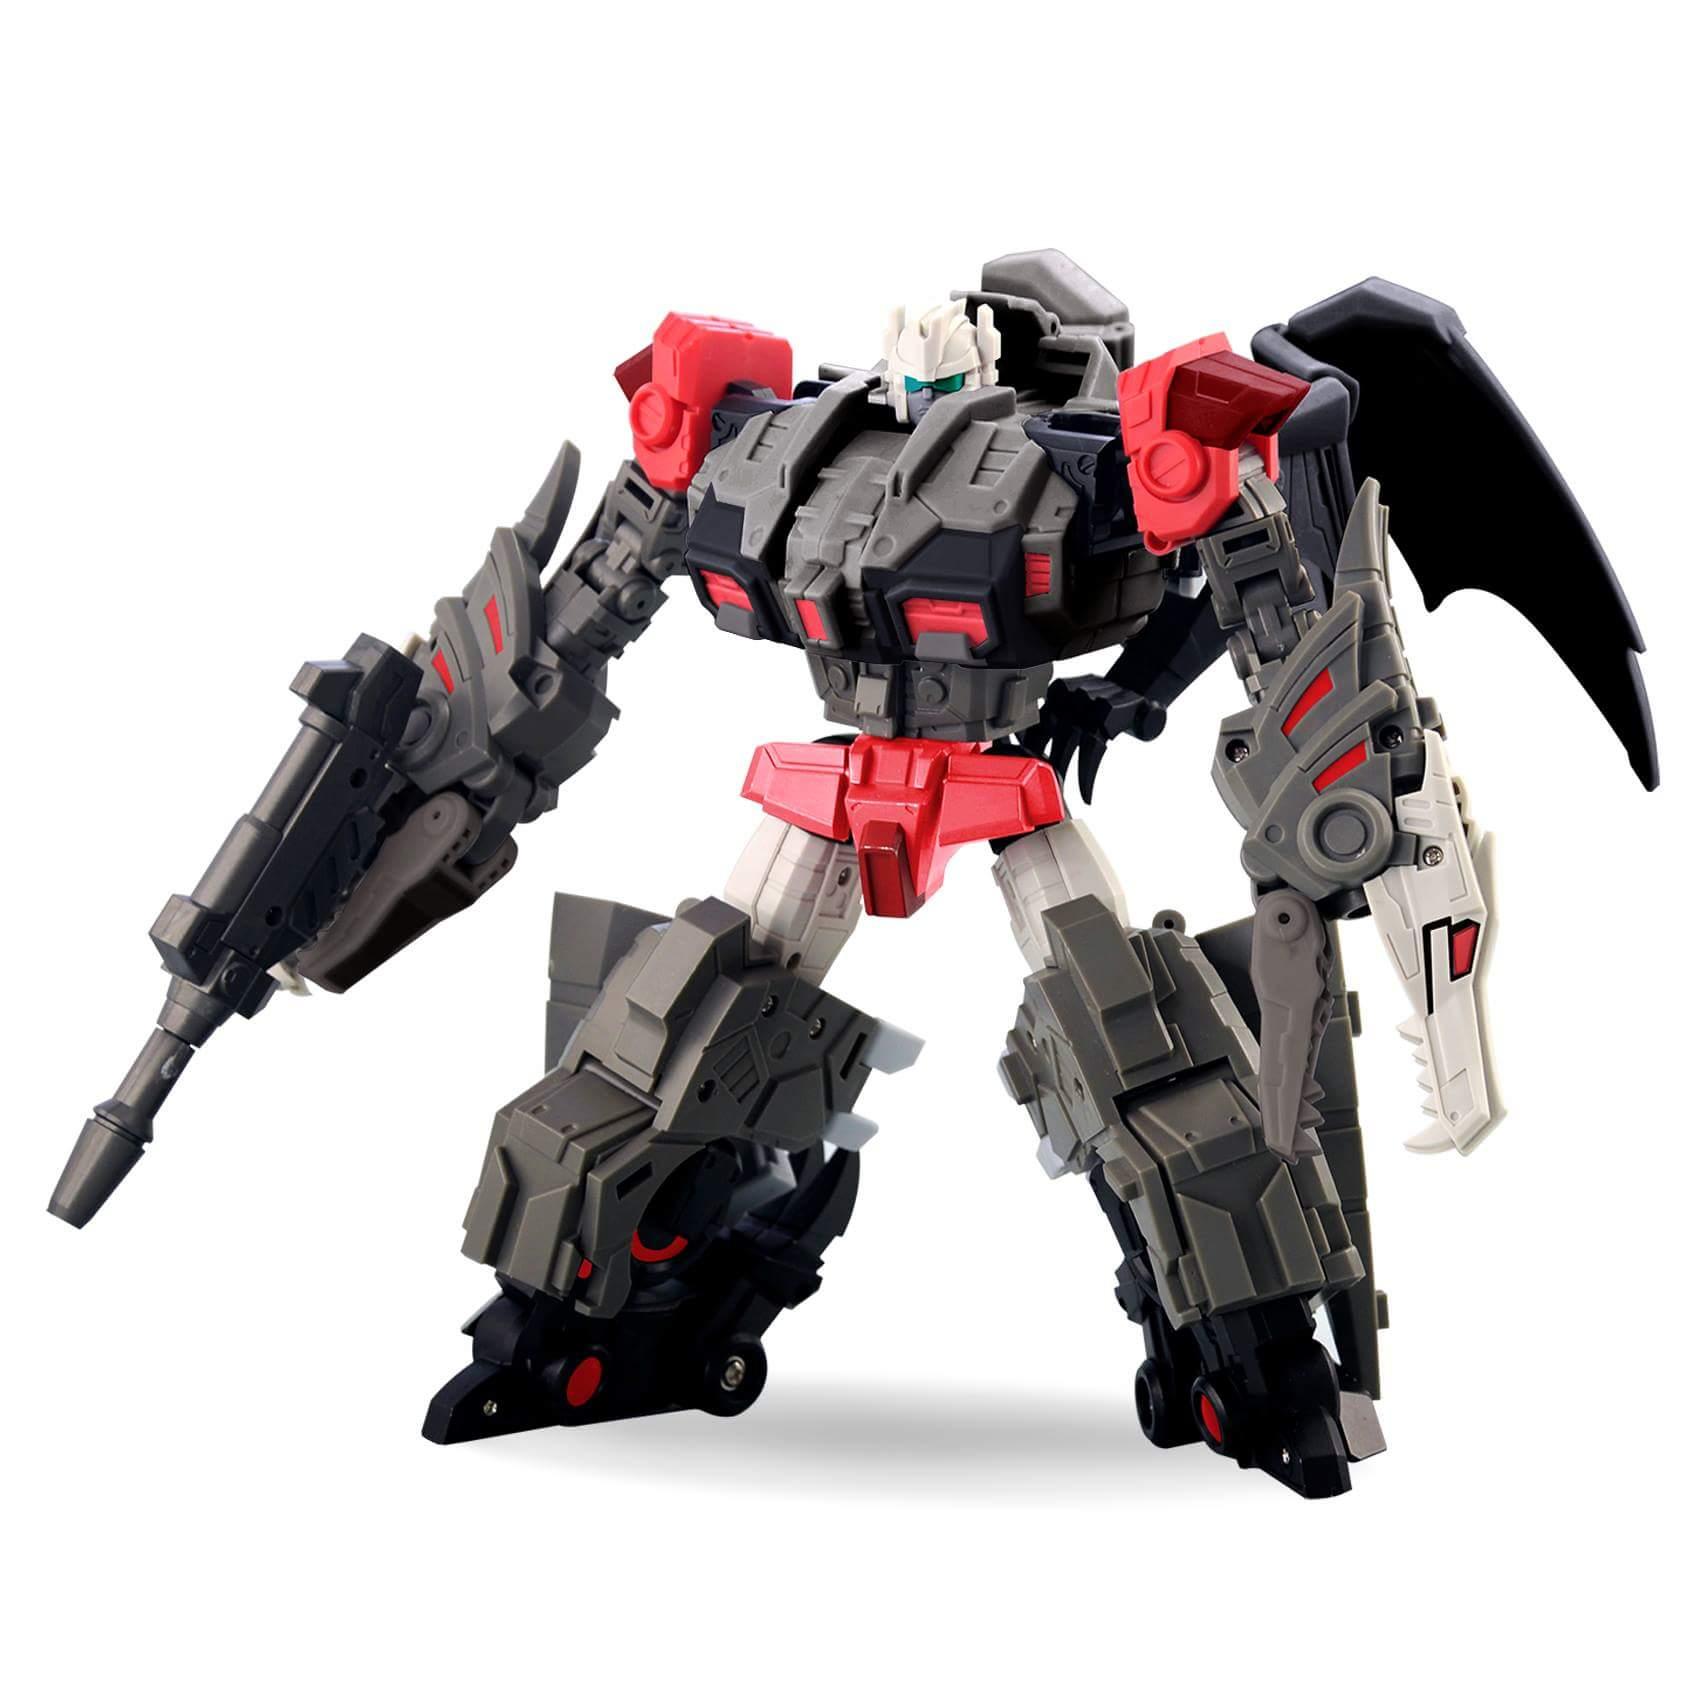 [FansHobby] Produit Tiers - Master Builder MB-02/03/05 - aka Monsterbots/Monstrebots - Page 2 WQUITijB